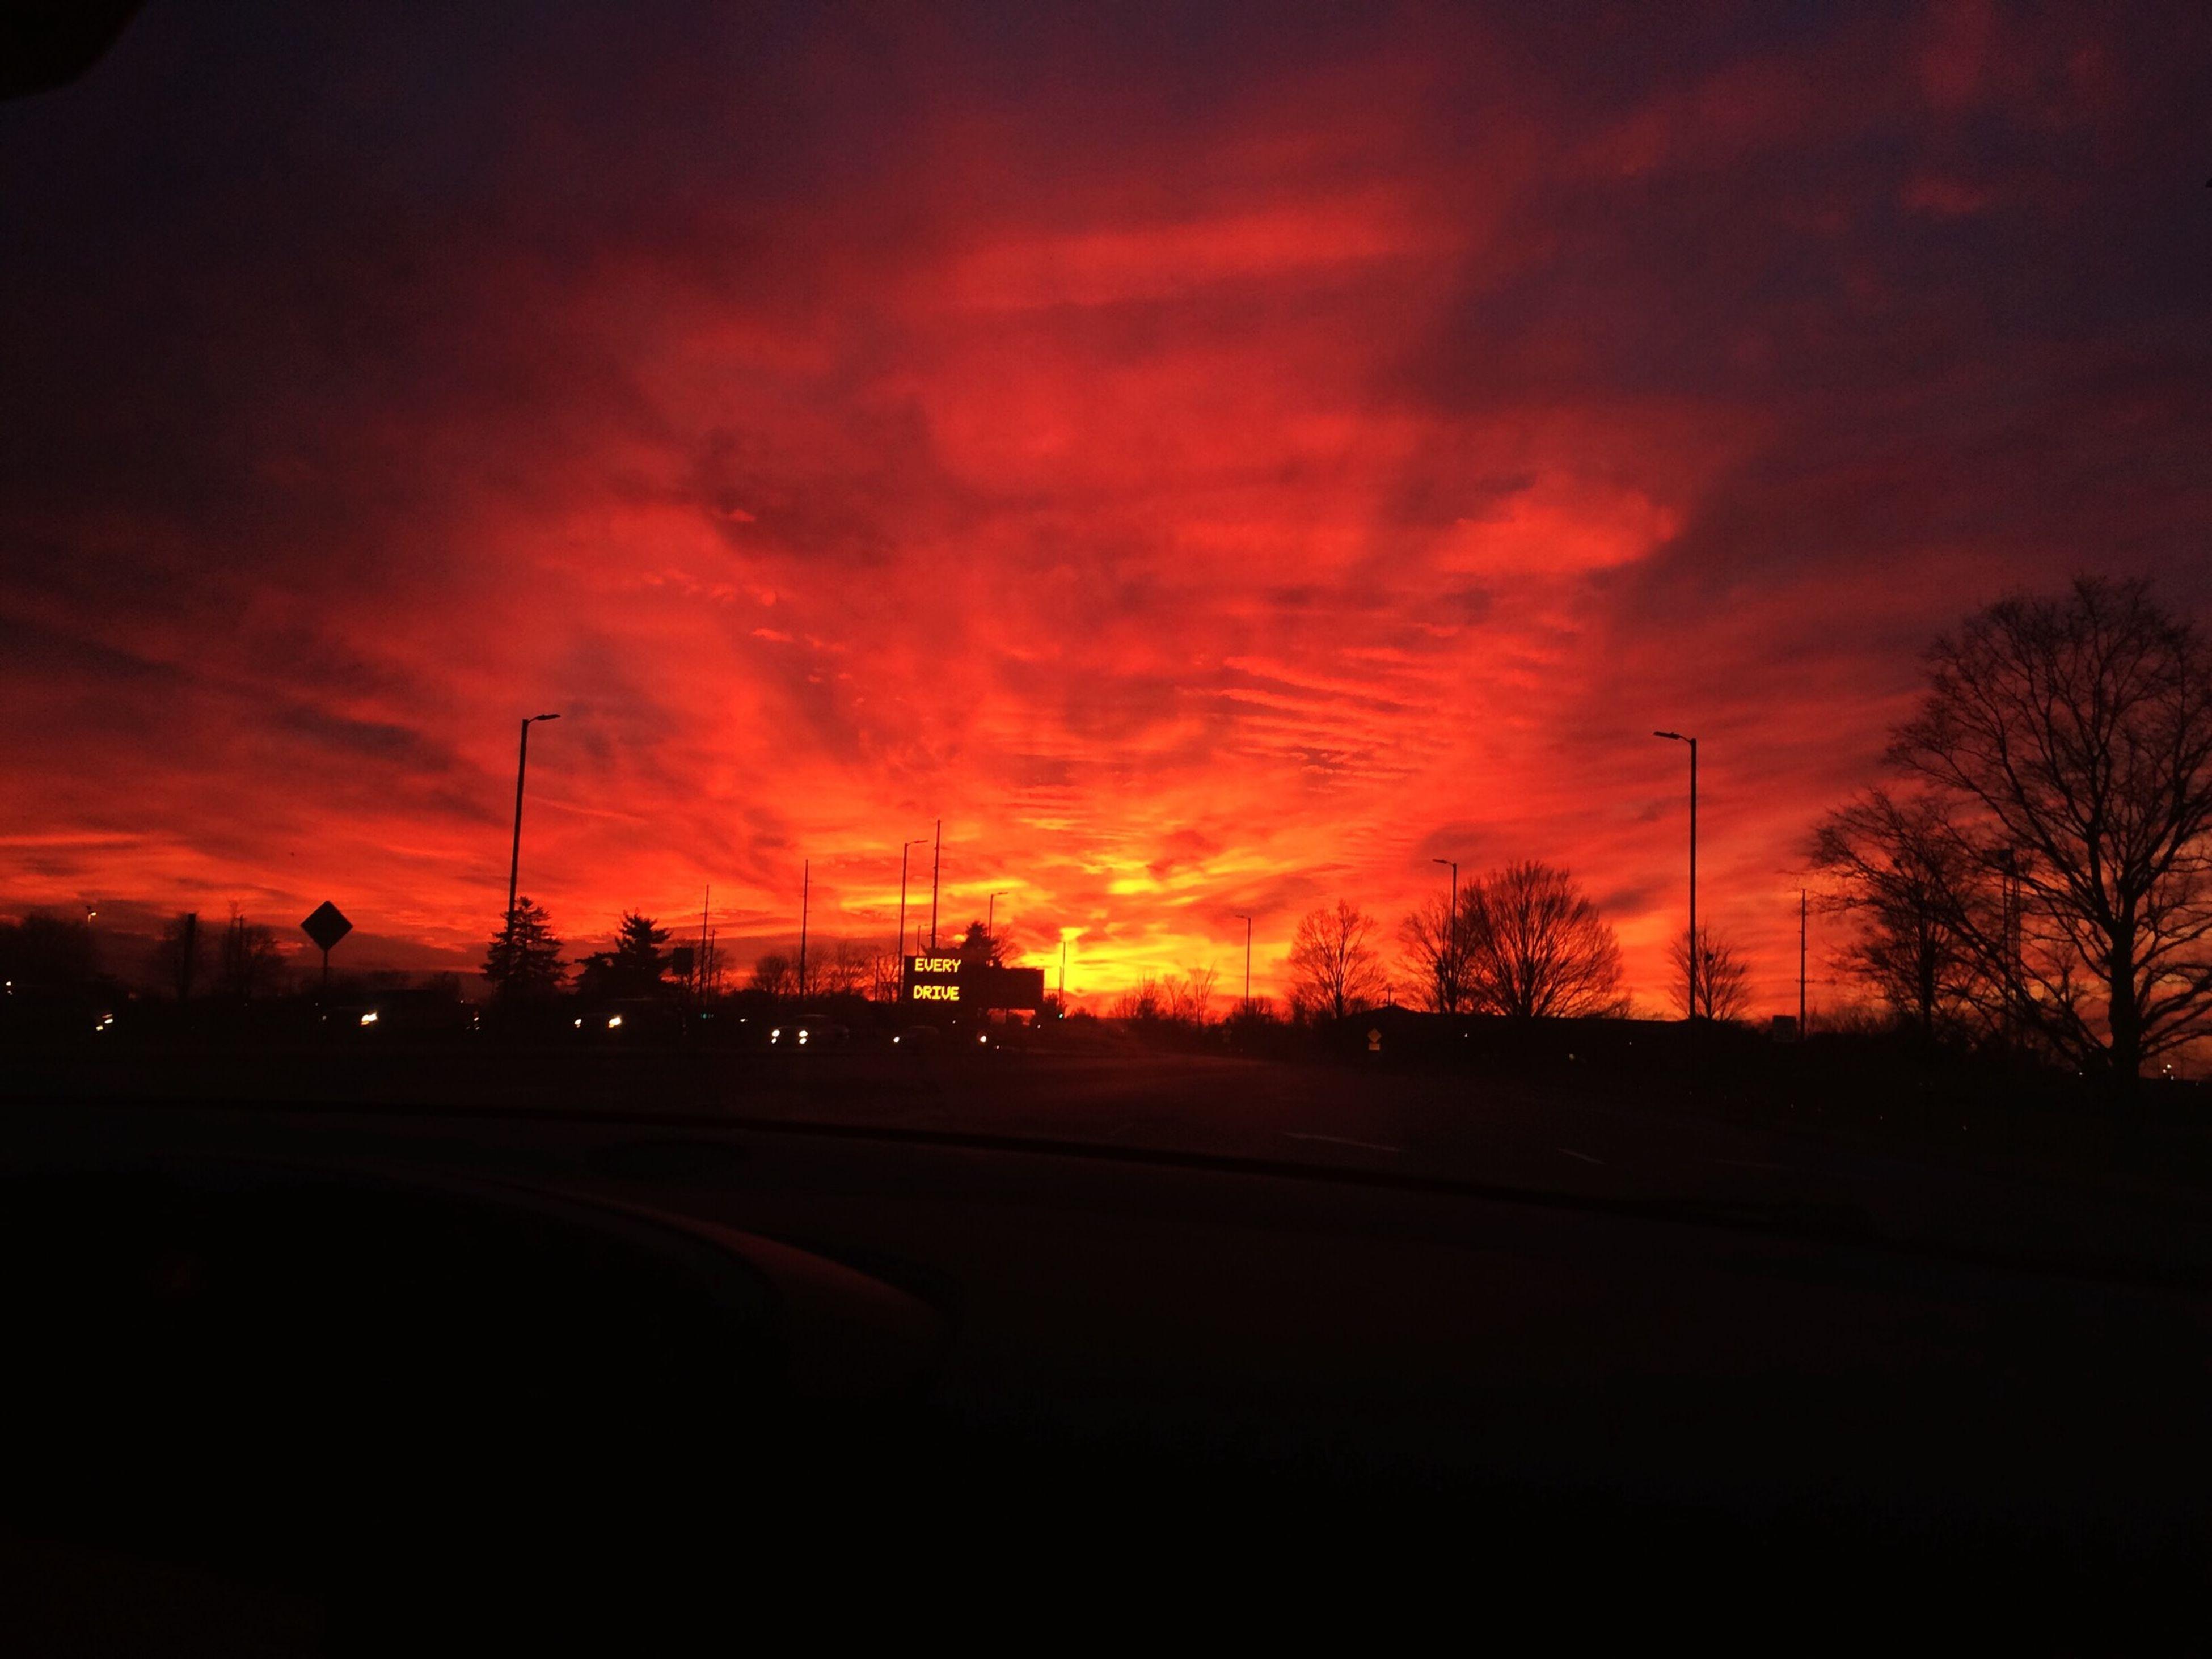 sunset, silhouette, orange color, transportation, sky, road, car, cloud - sky, scenics, beauty in nature, dramatic sky, tree, land vehicle, dark, tranquil scene, landscape, tranquility, nature, street, sun